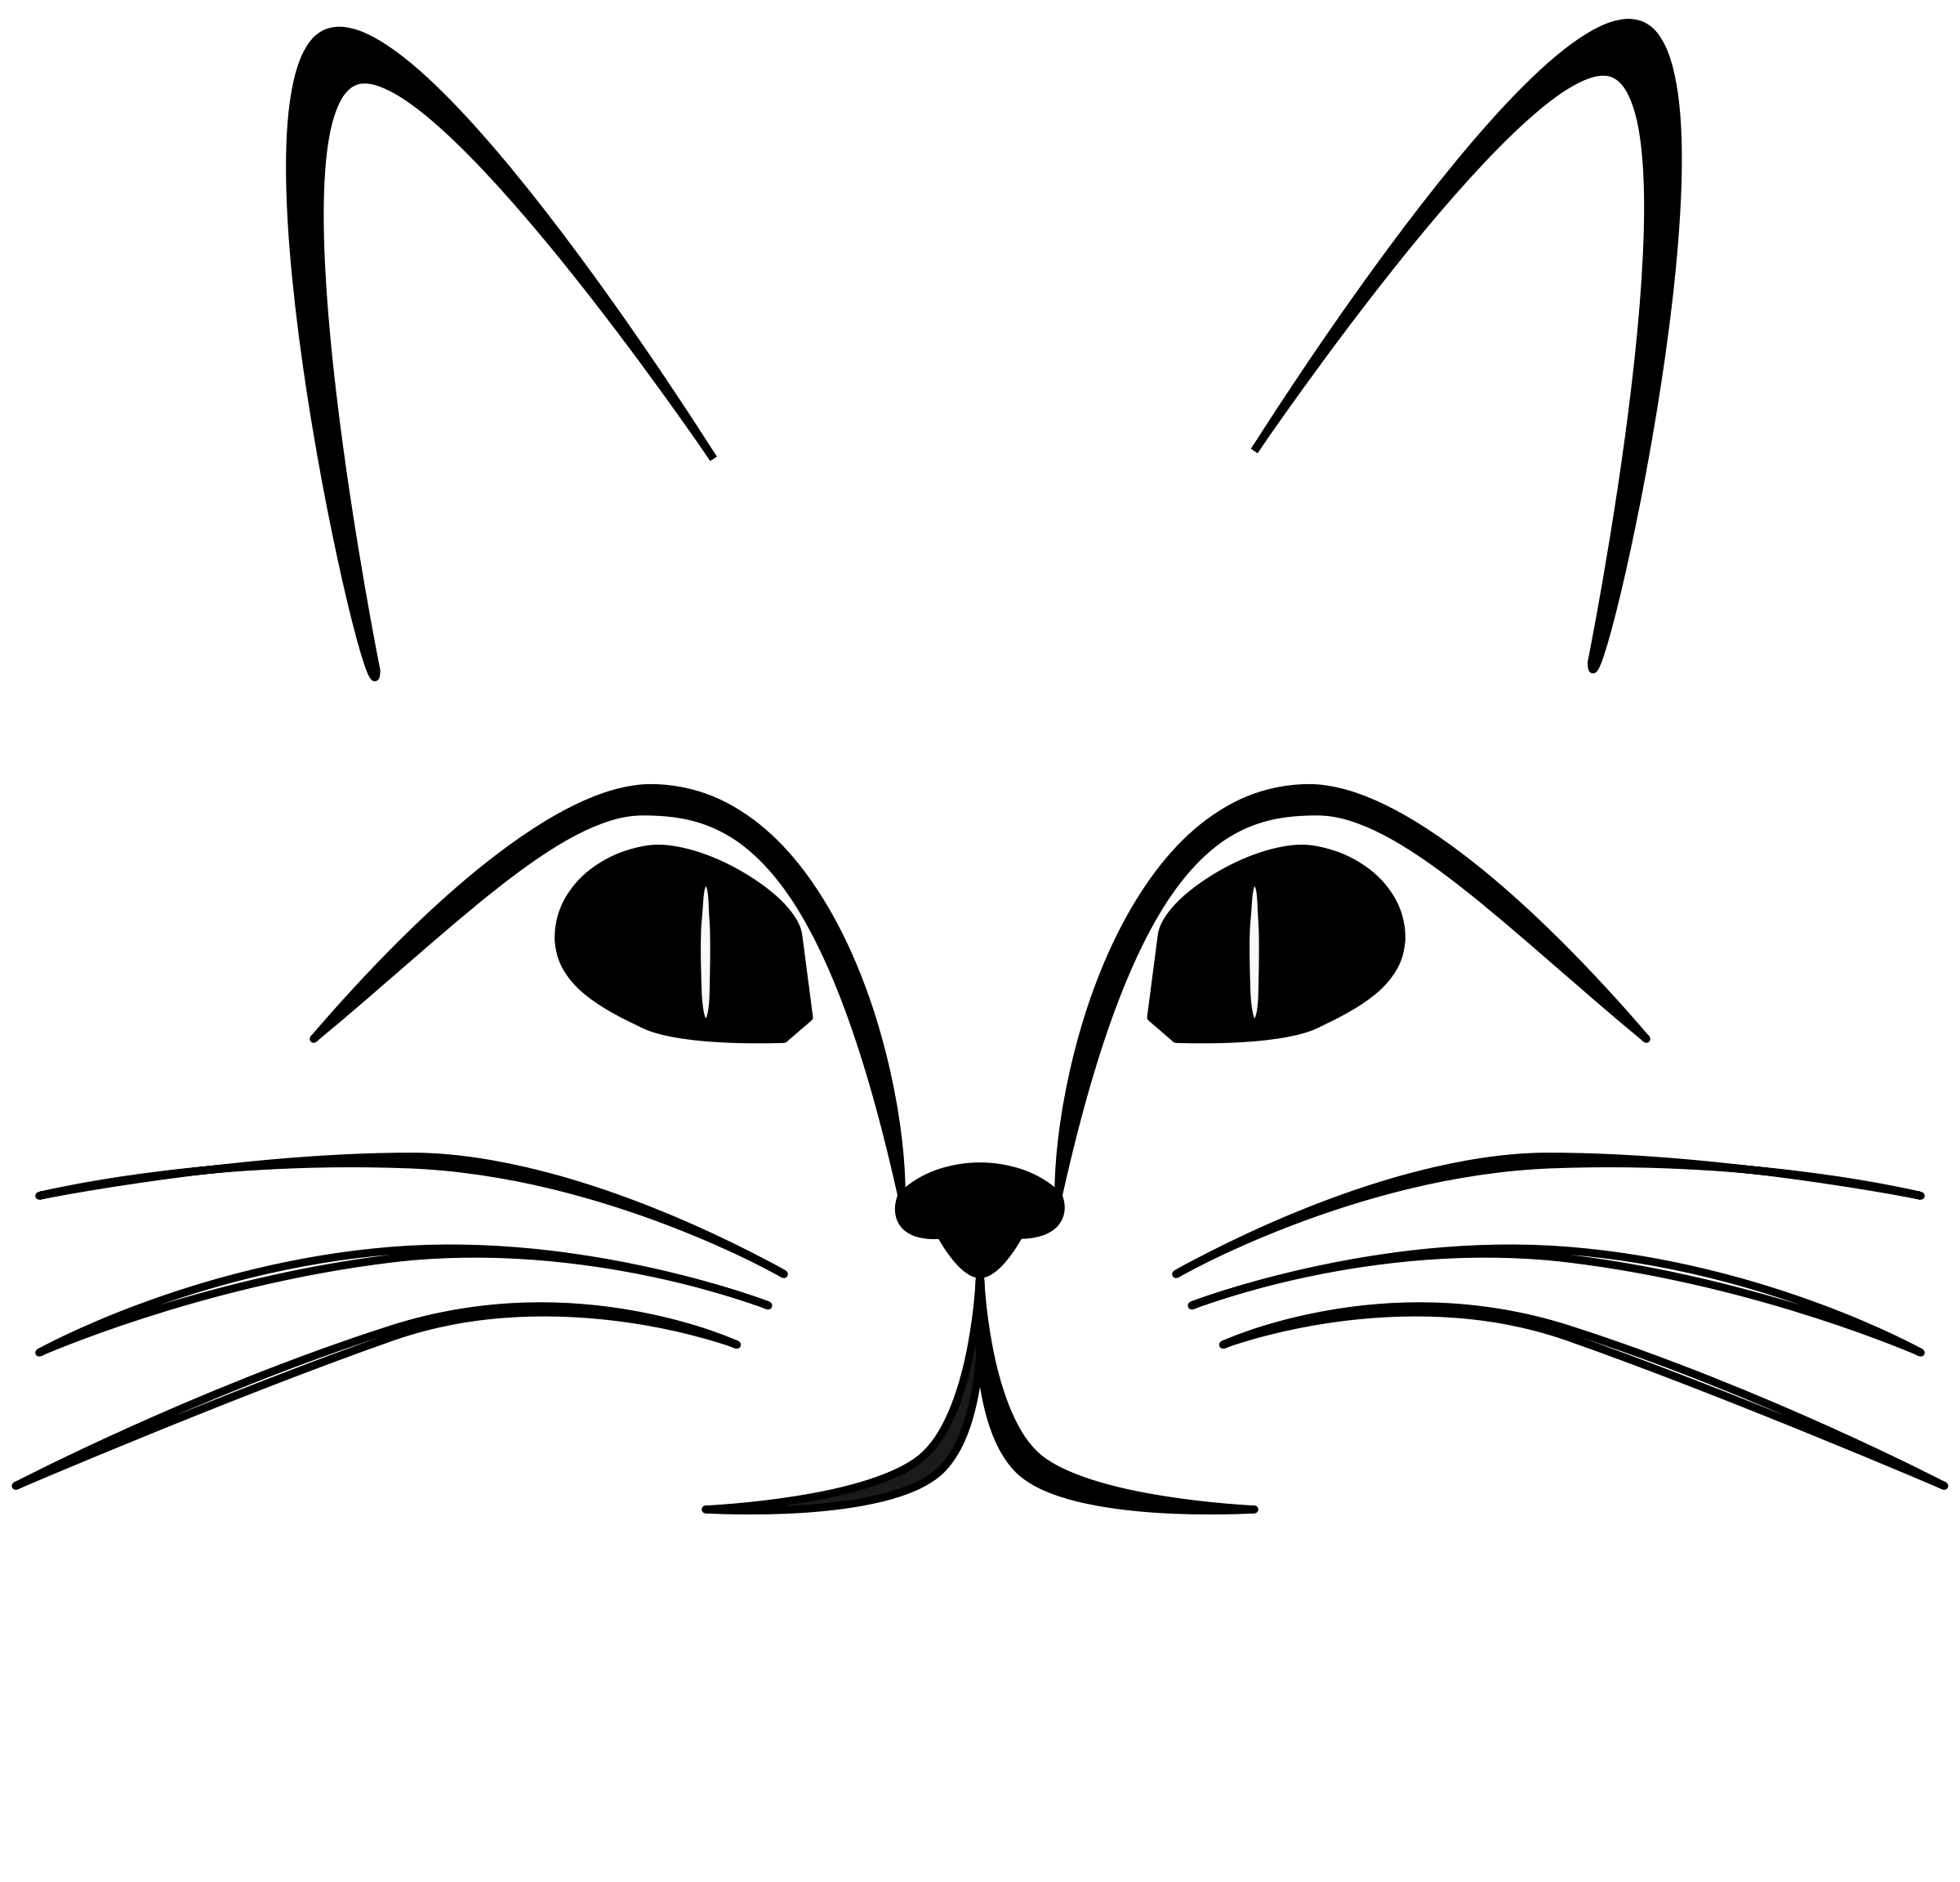 Cat Face Clipart-cat face clipart-2